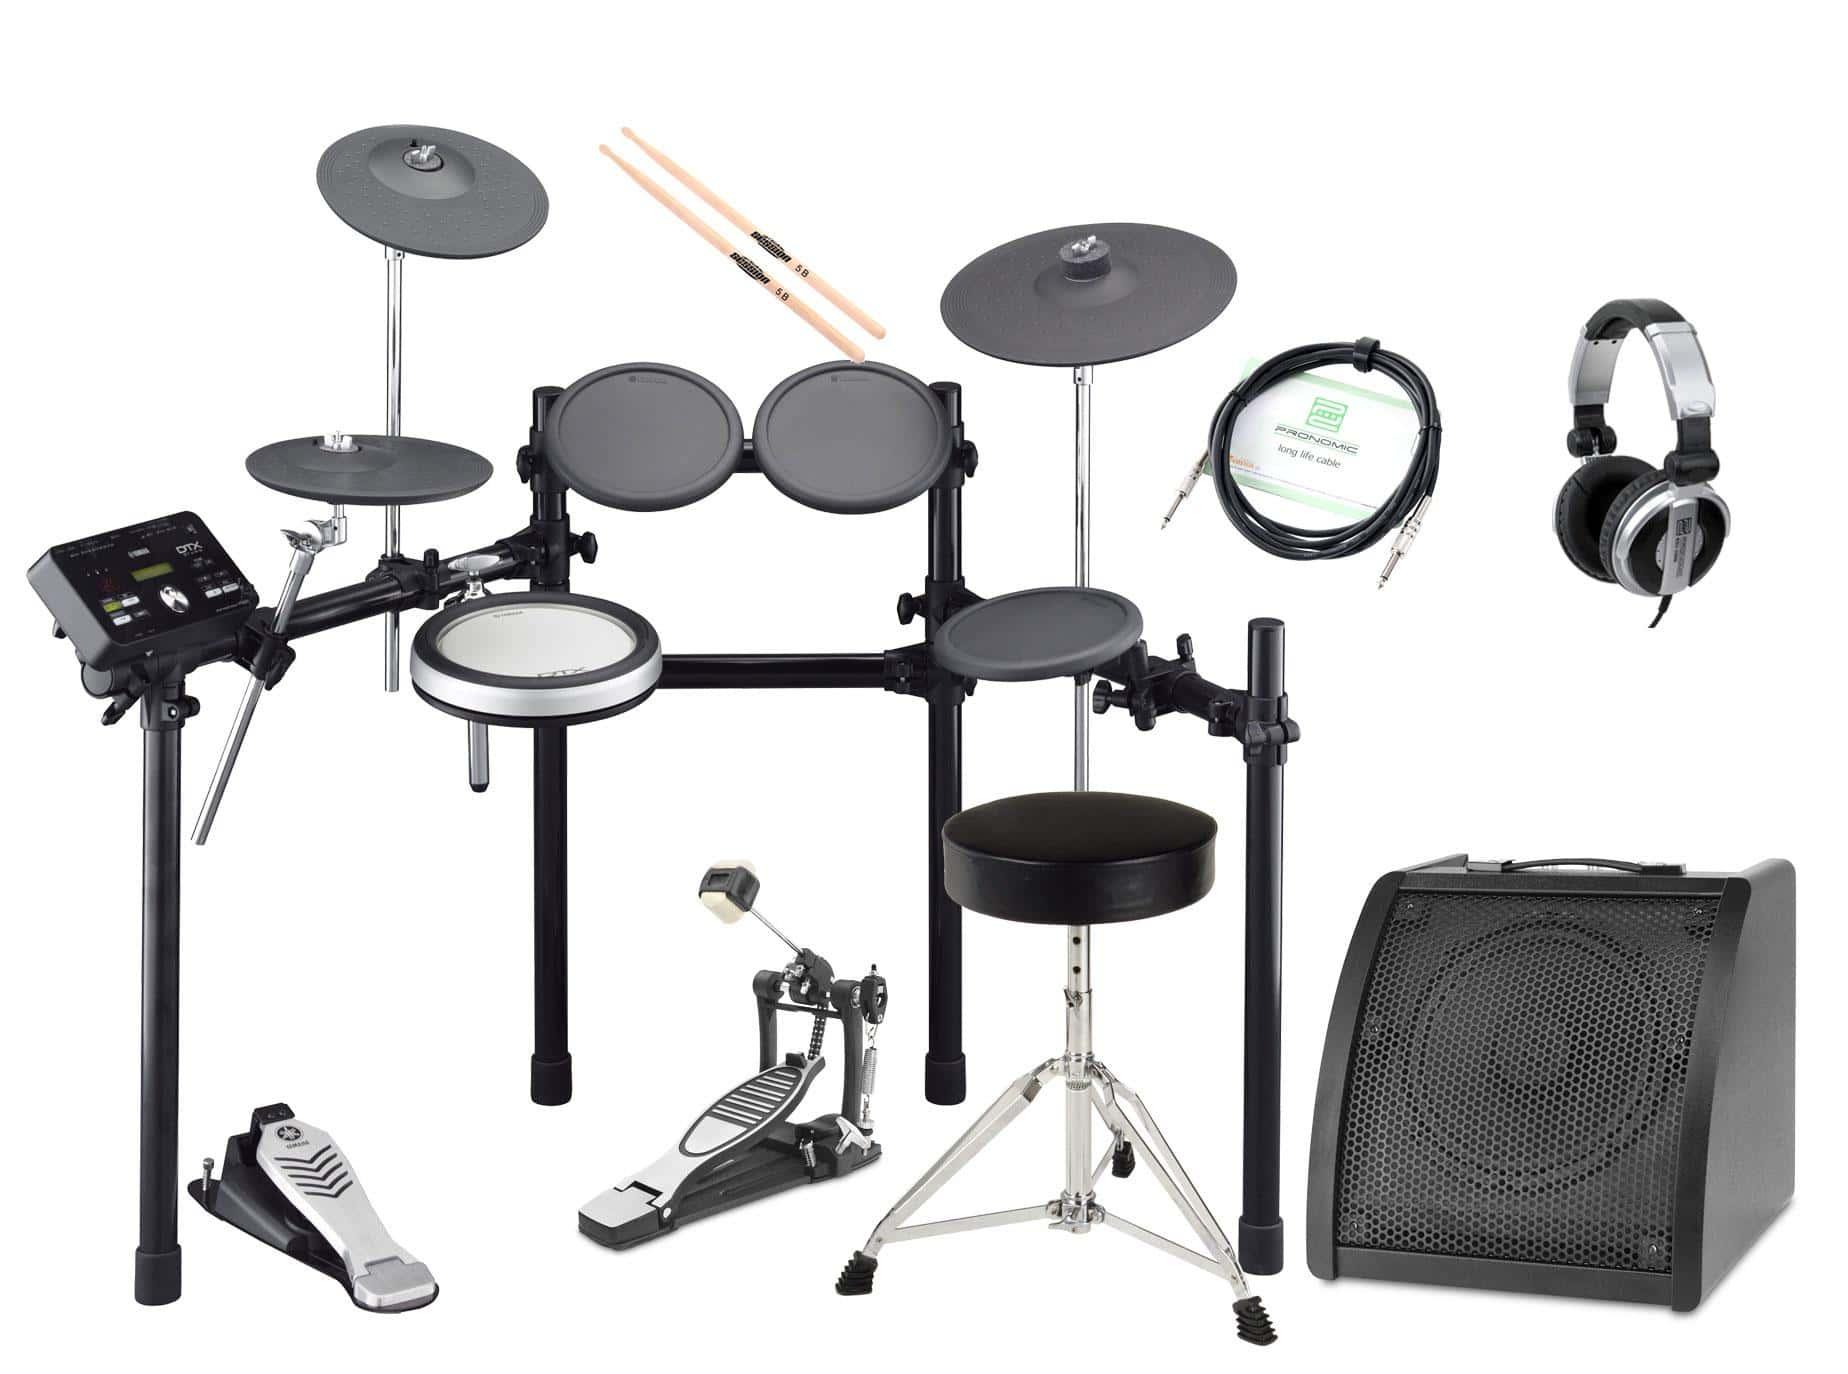 Yamaha DTX522K Compact E Drum SET inkl. Kopfhörer, Hocker, Drum Monitor und Sticks